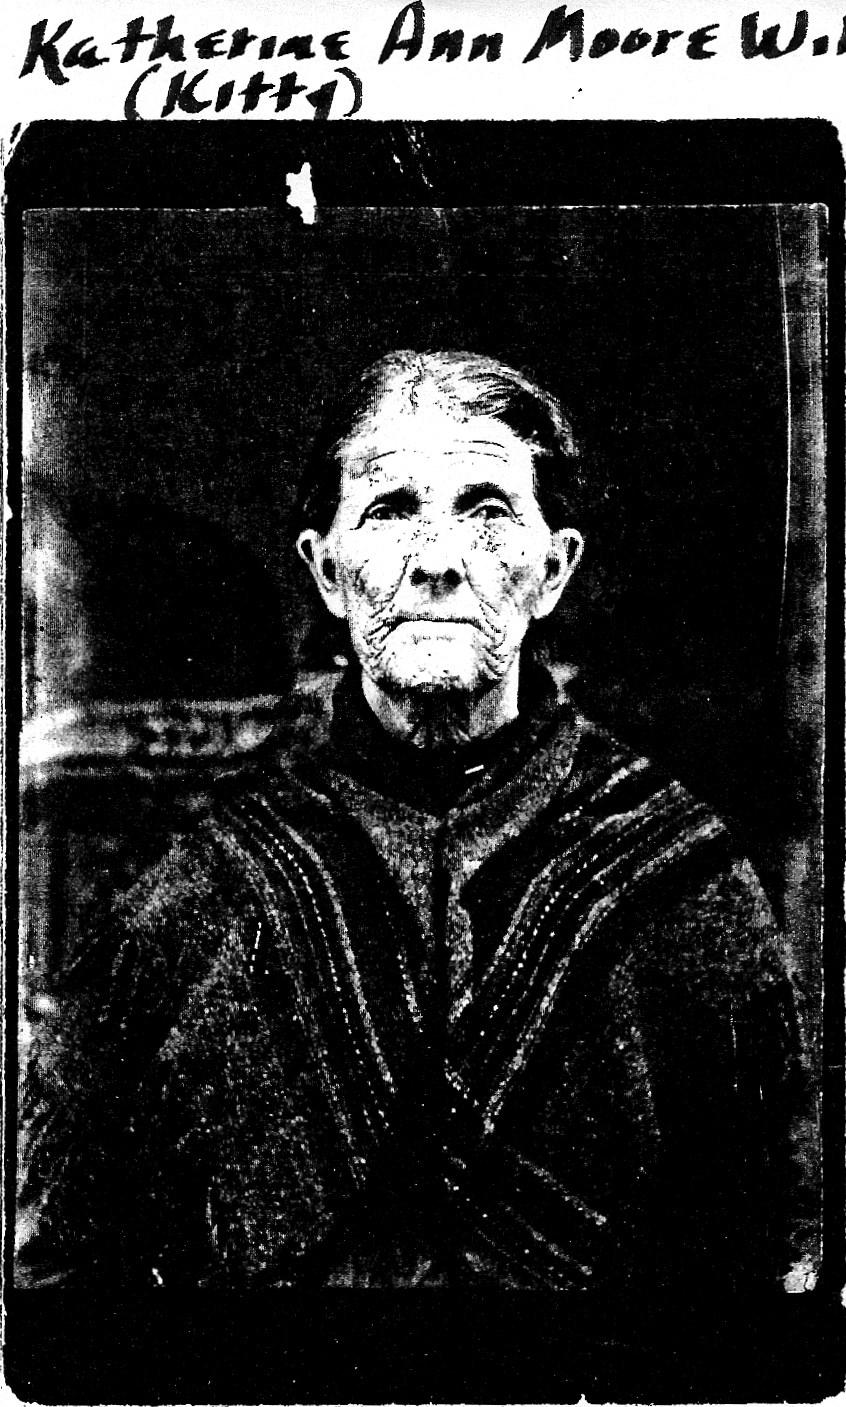 Katherine Ann Moore